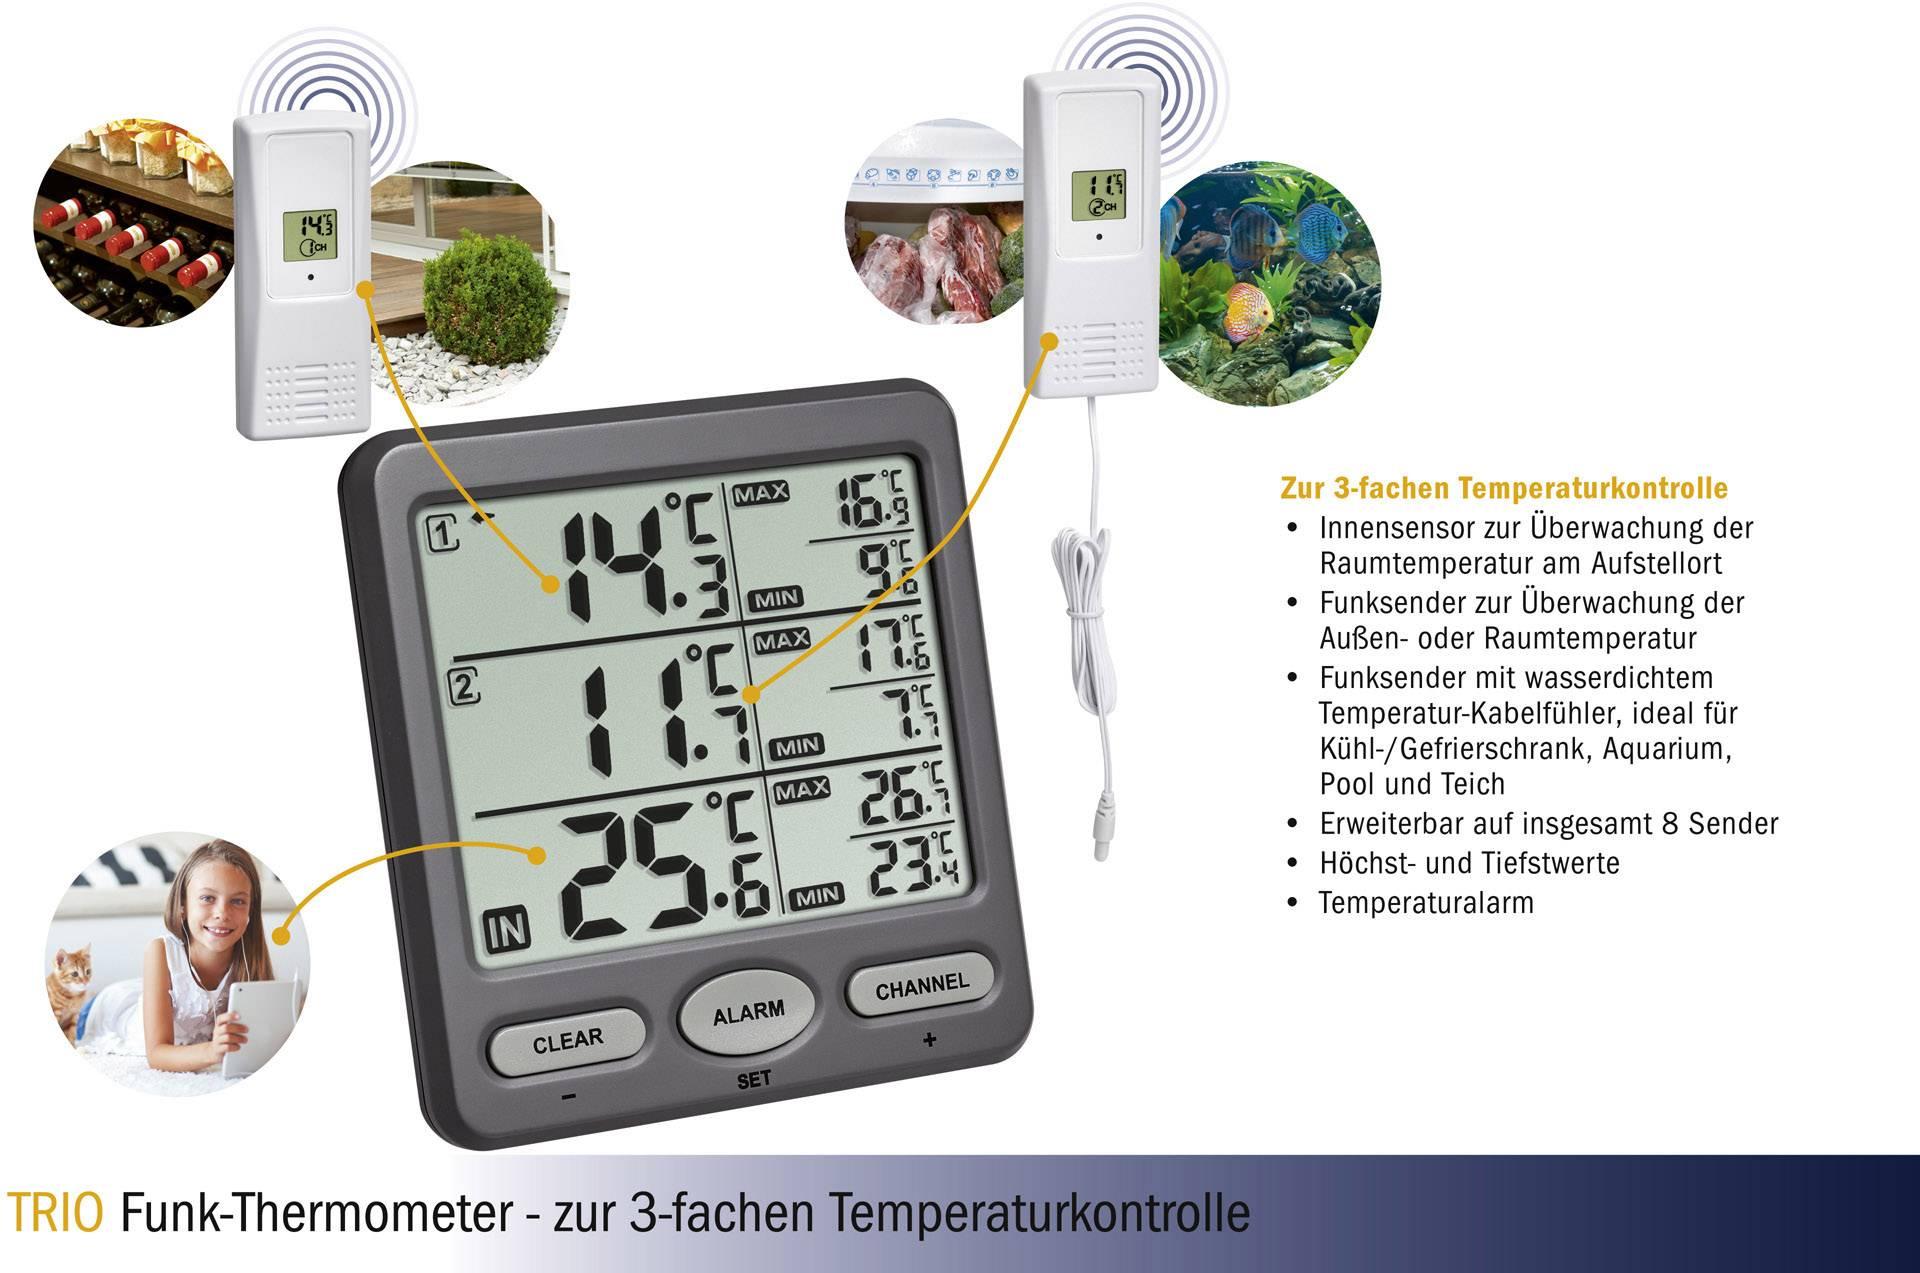 Kühlschrank Thermometer Funk : Tfa trio funk thermometer anthrazit kaufen